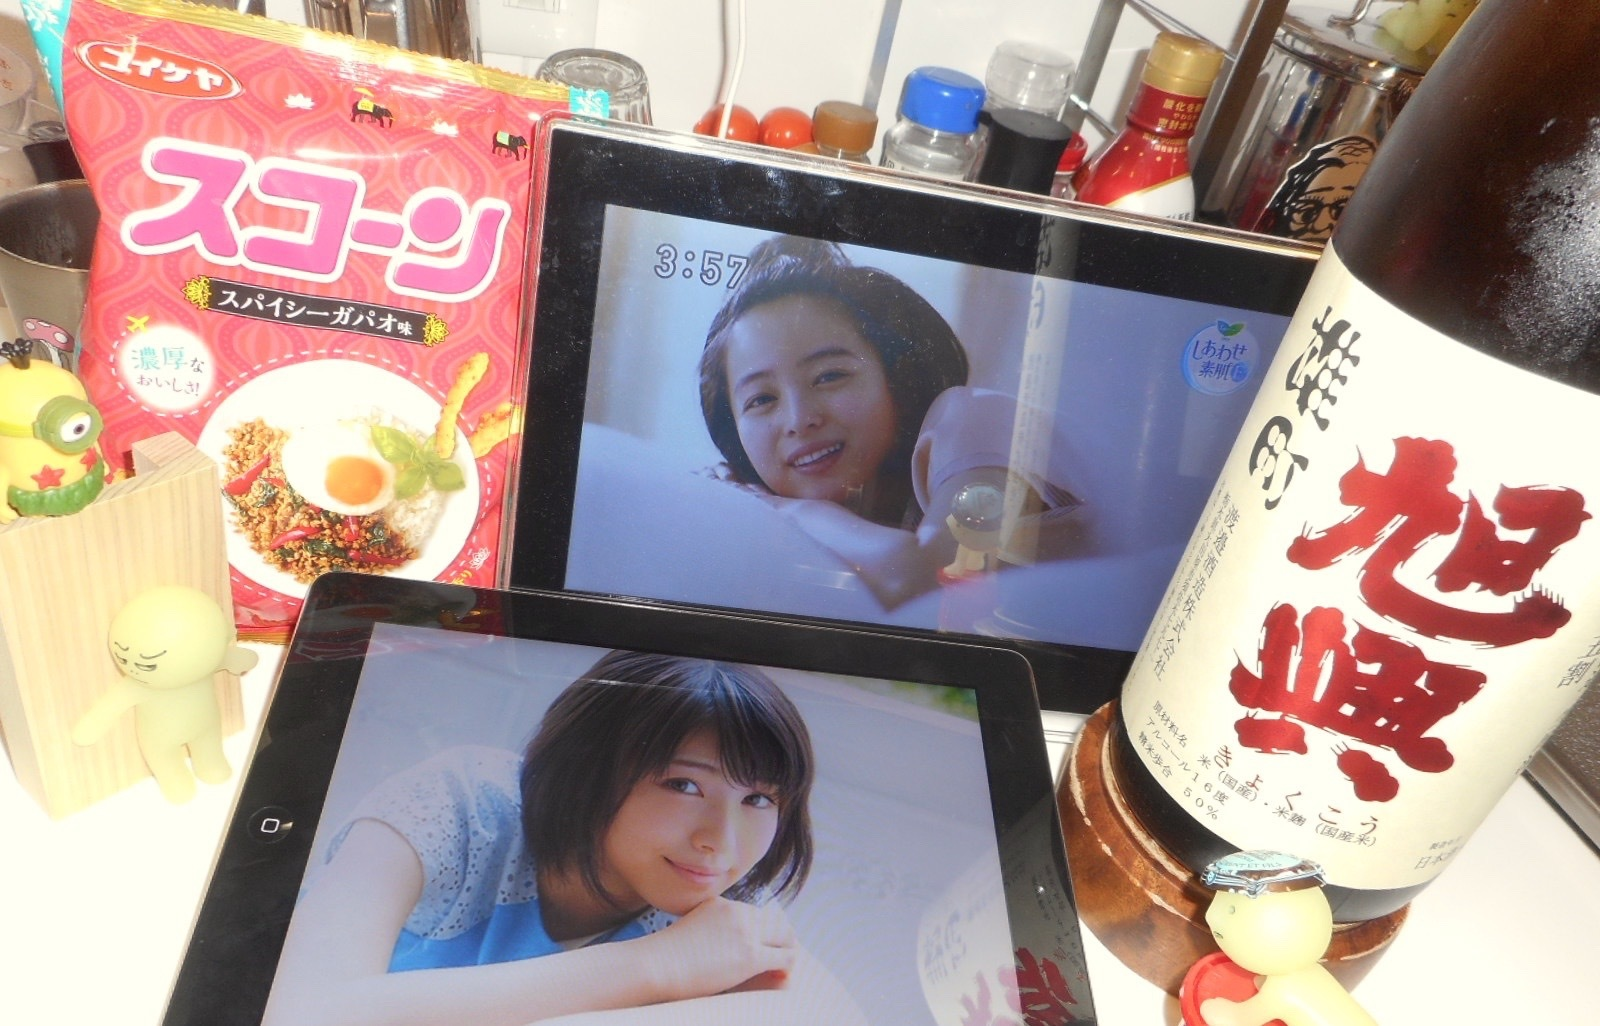 kyokukou_omachi50namagen29by2_1.jpg